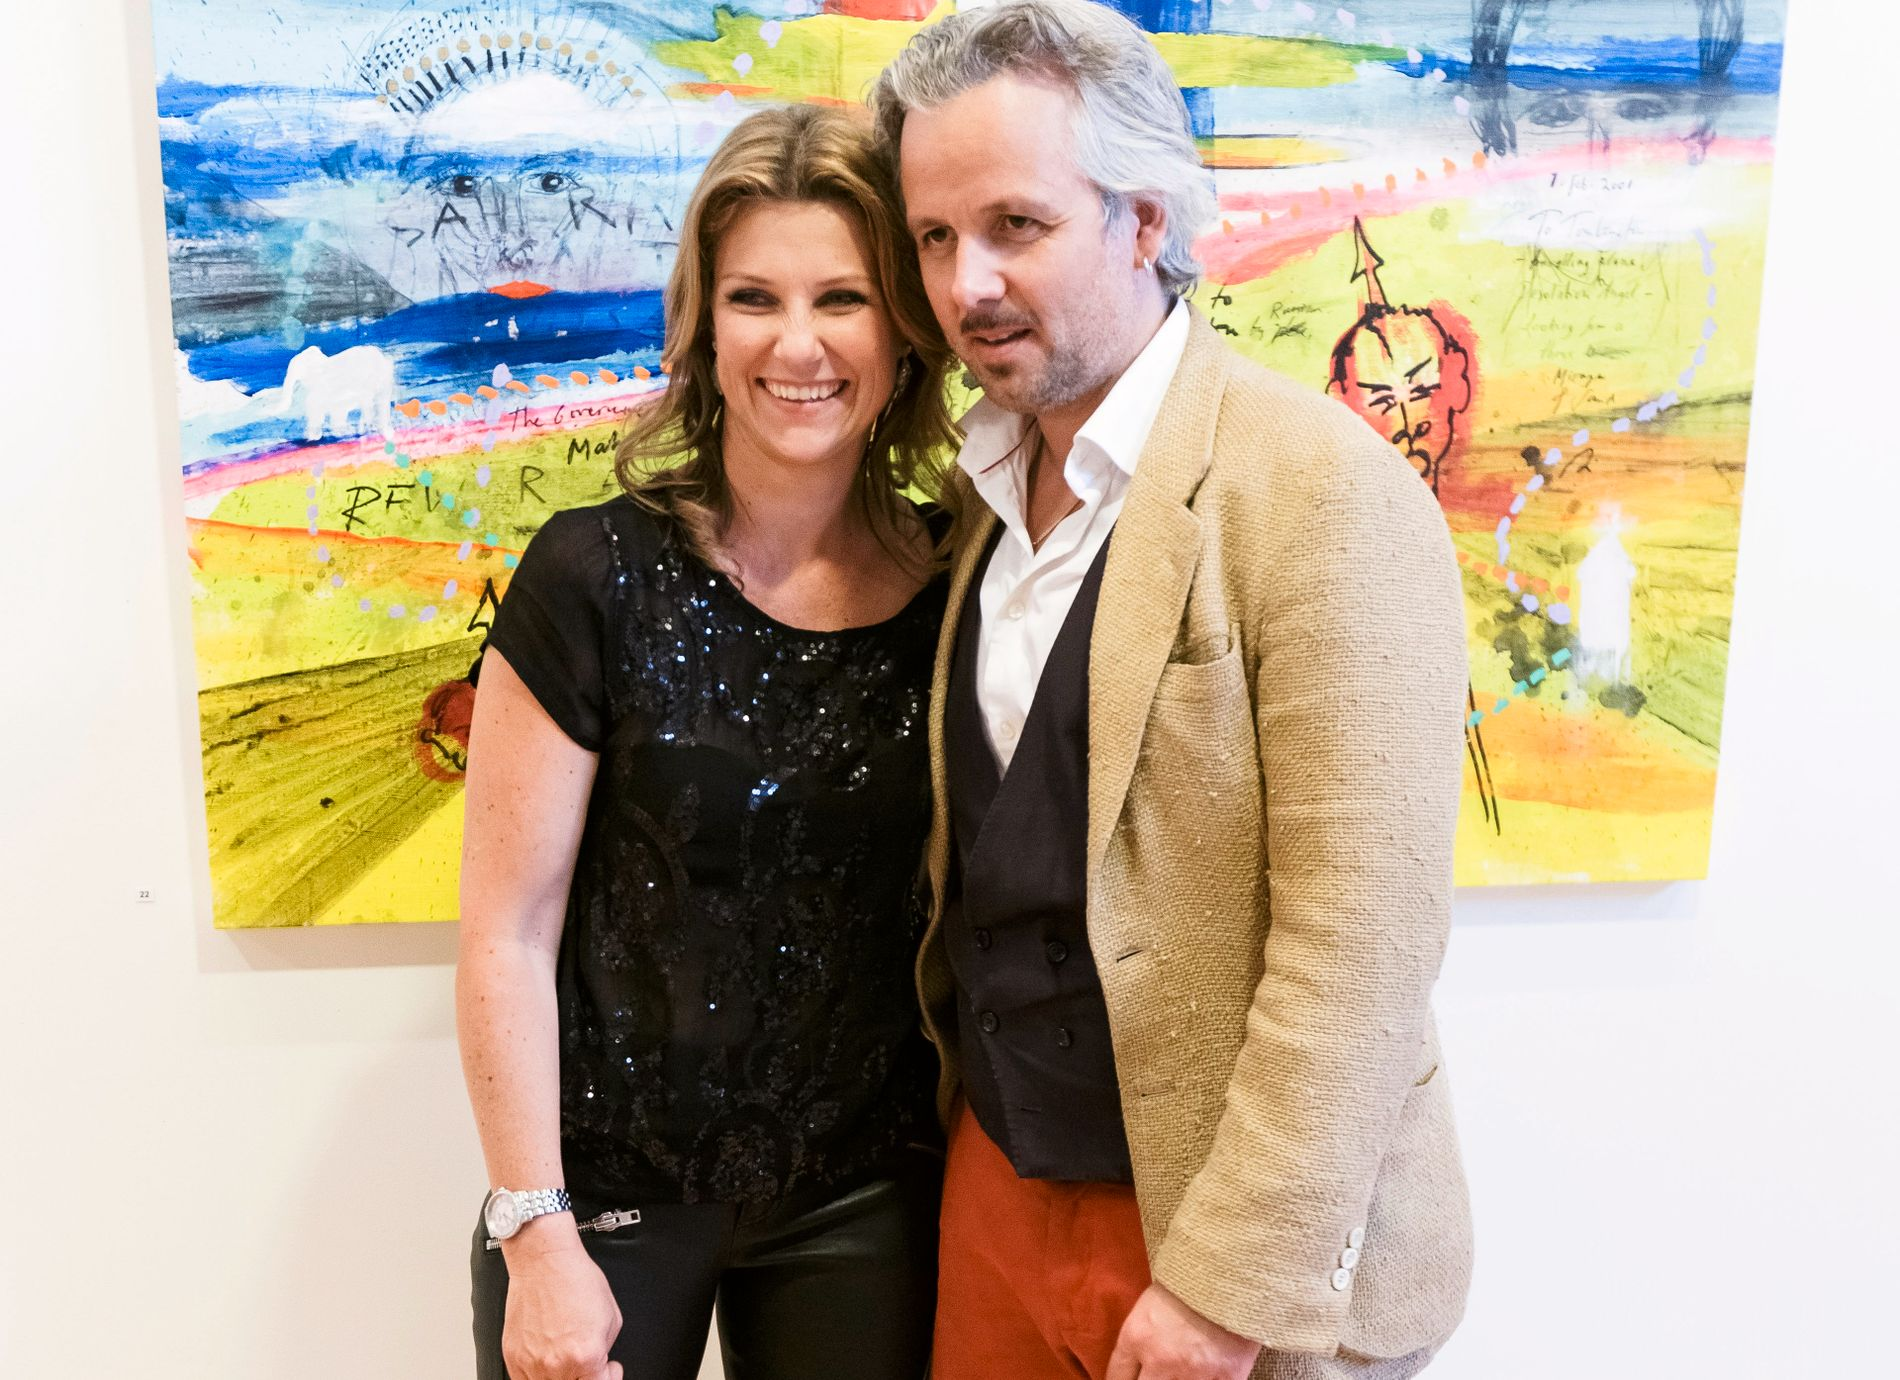 2014: Märtha Louise sammen med Ari Behn på hans utstilling i Drammen – to år før bruddet.